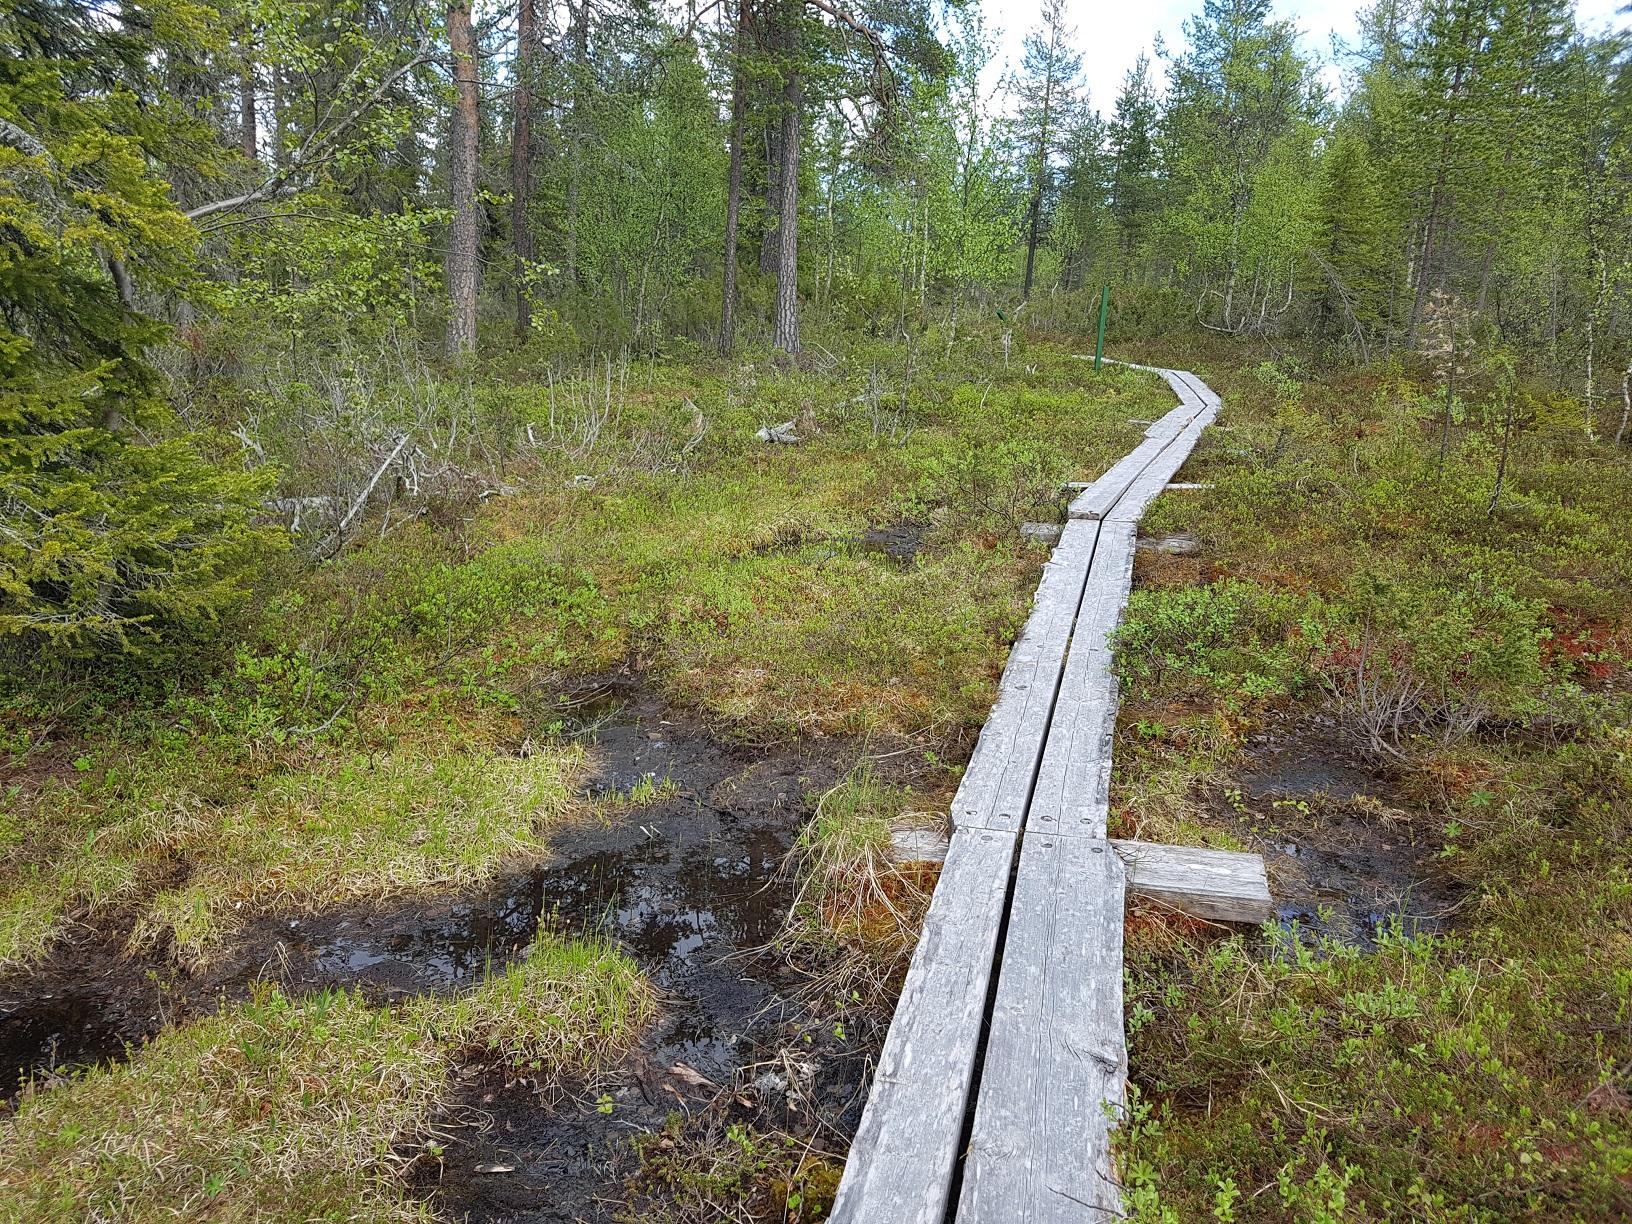 Urho-Kekkonen-Nationalpark